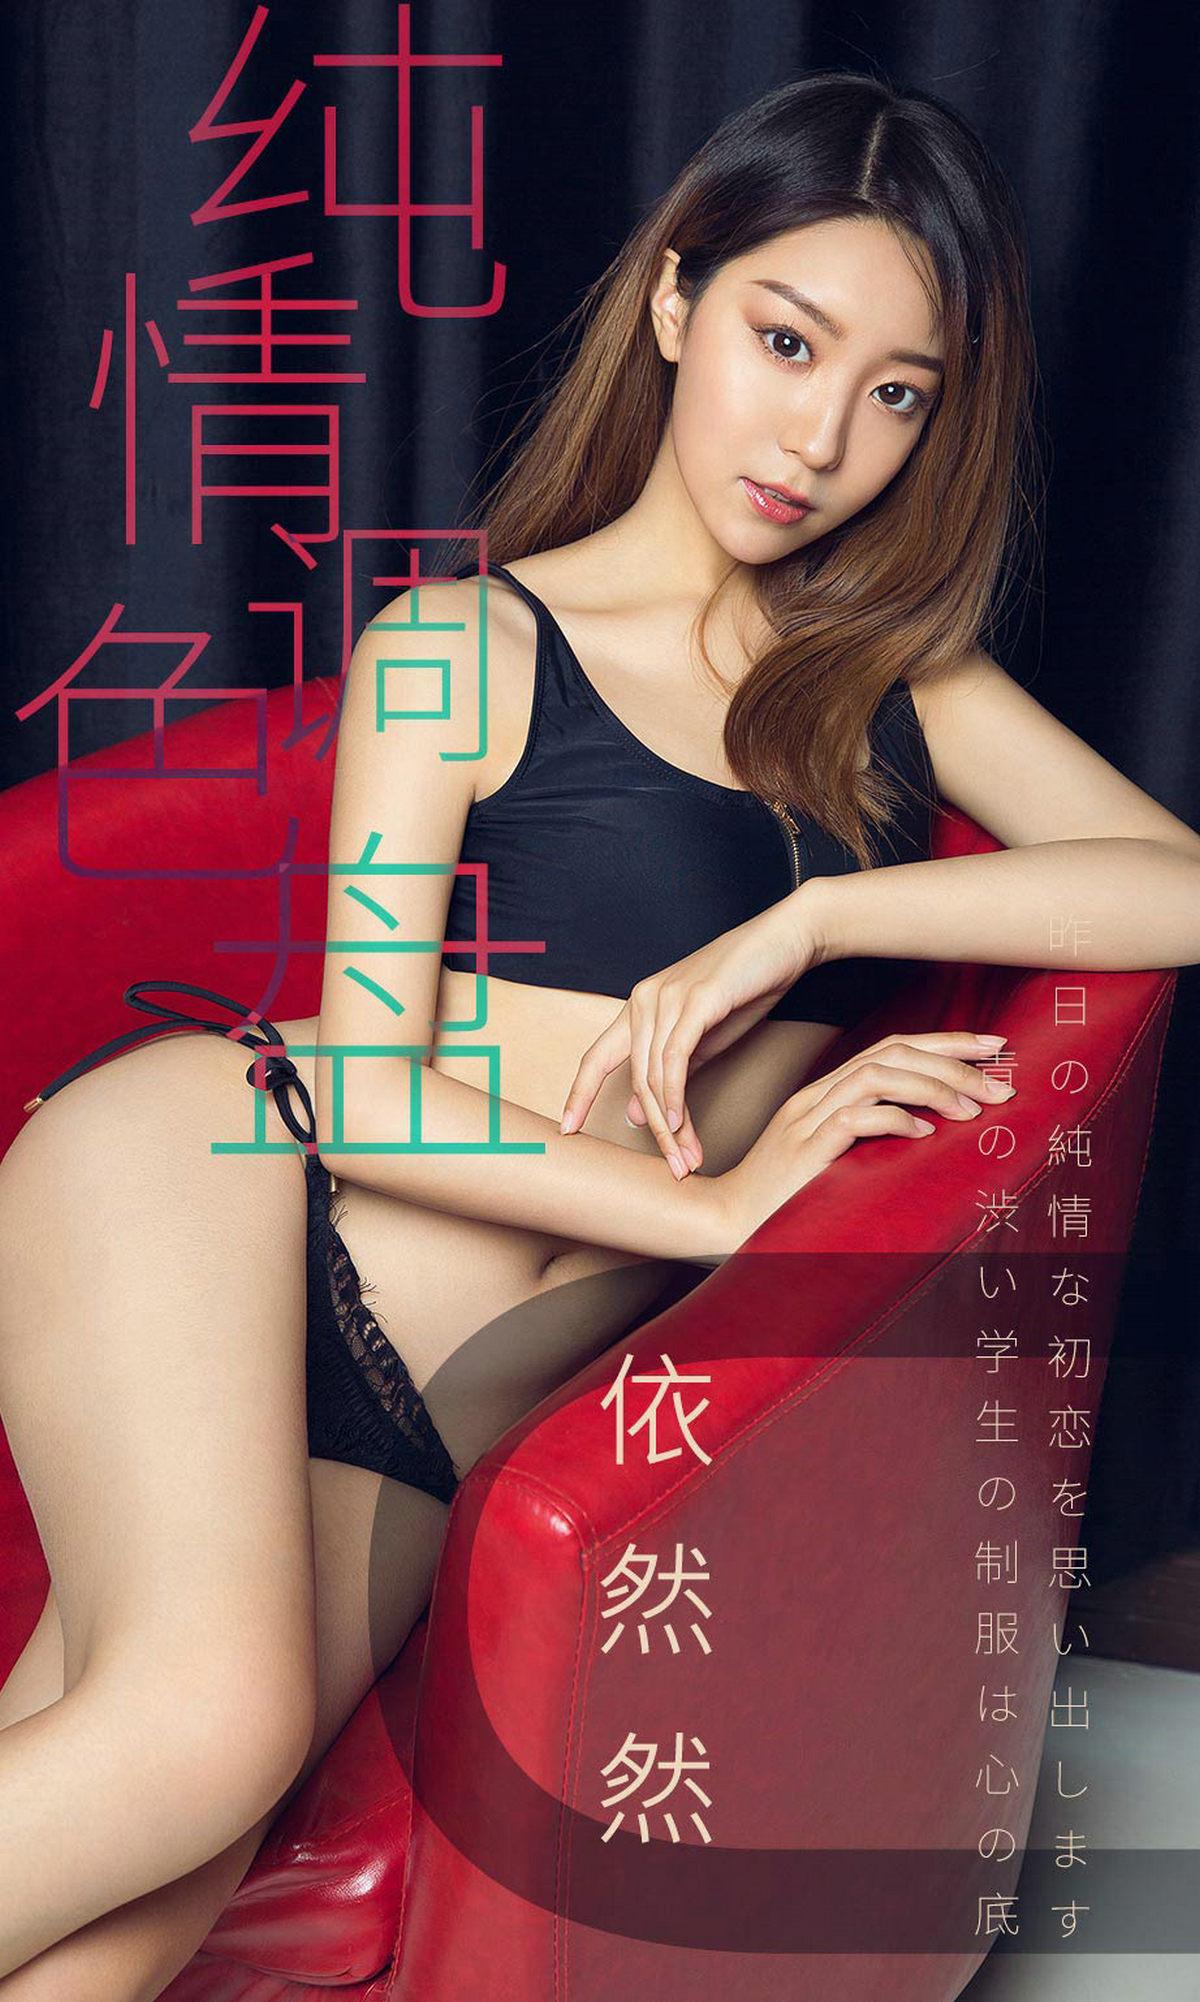 [Ugirls]爱尤物 No.1413 纯情调色盘 依然然